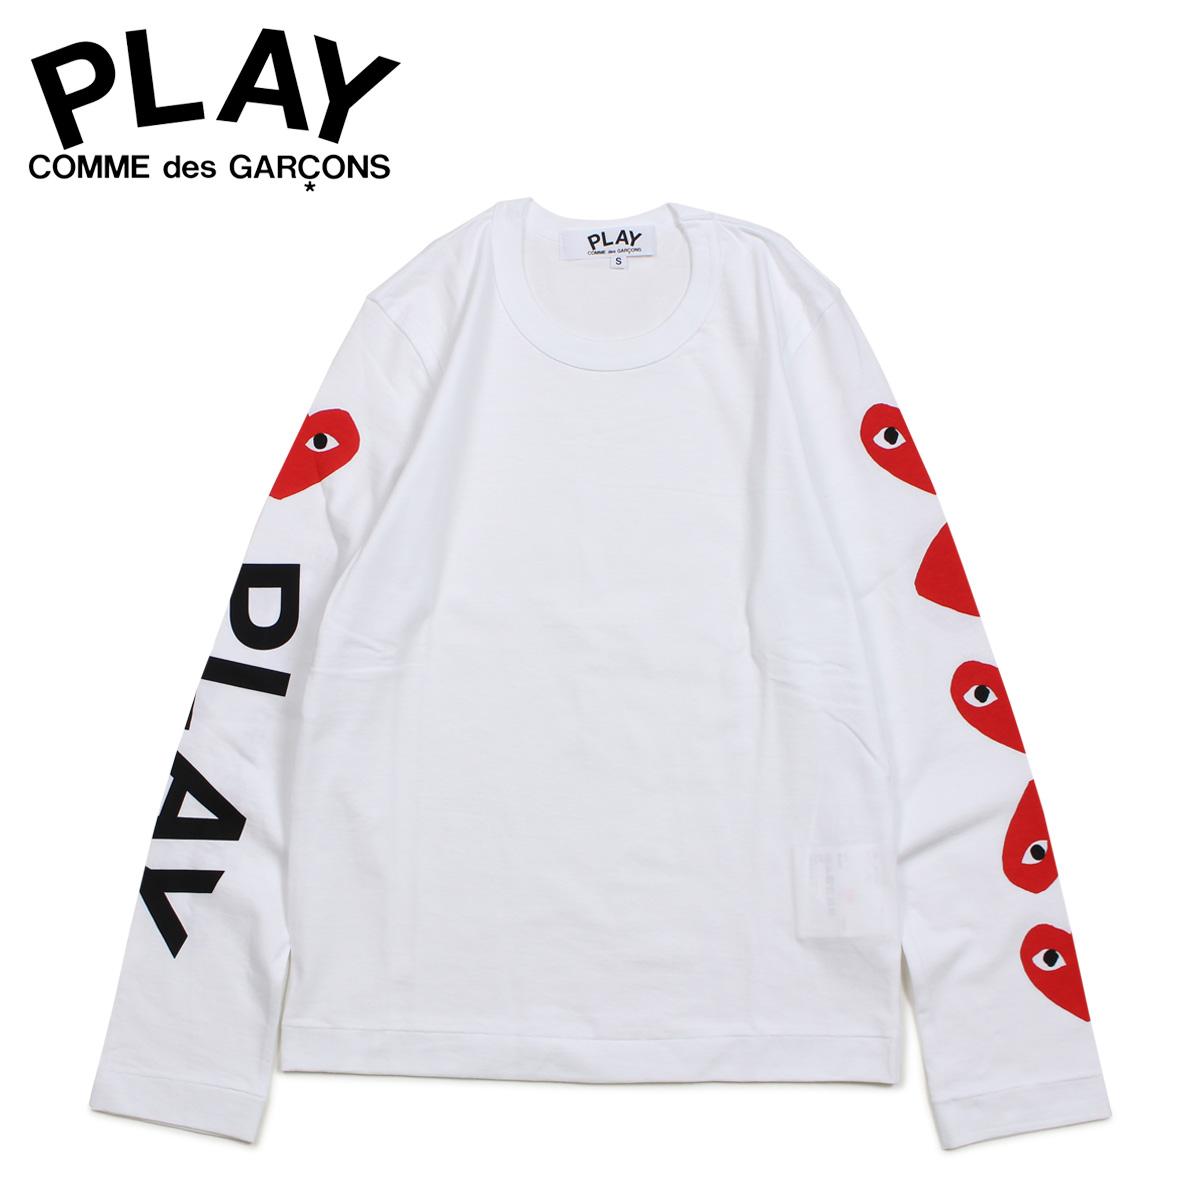 PLAY COMME des GARCONS コムデギャルソン Tシャツ レディース 長袖 ロンT RED HEART LONG SLEEVE ホワイト 白 AZ-T261 [3/29 新入荷]